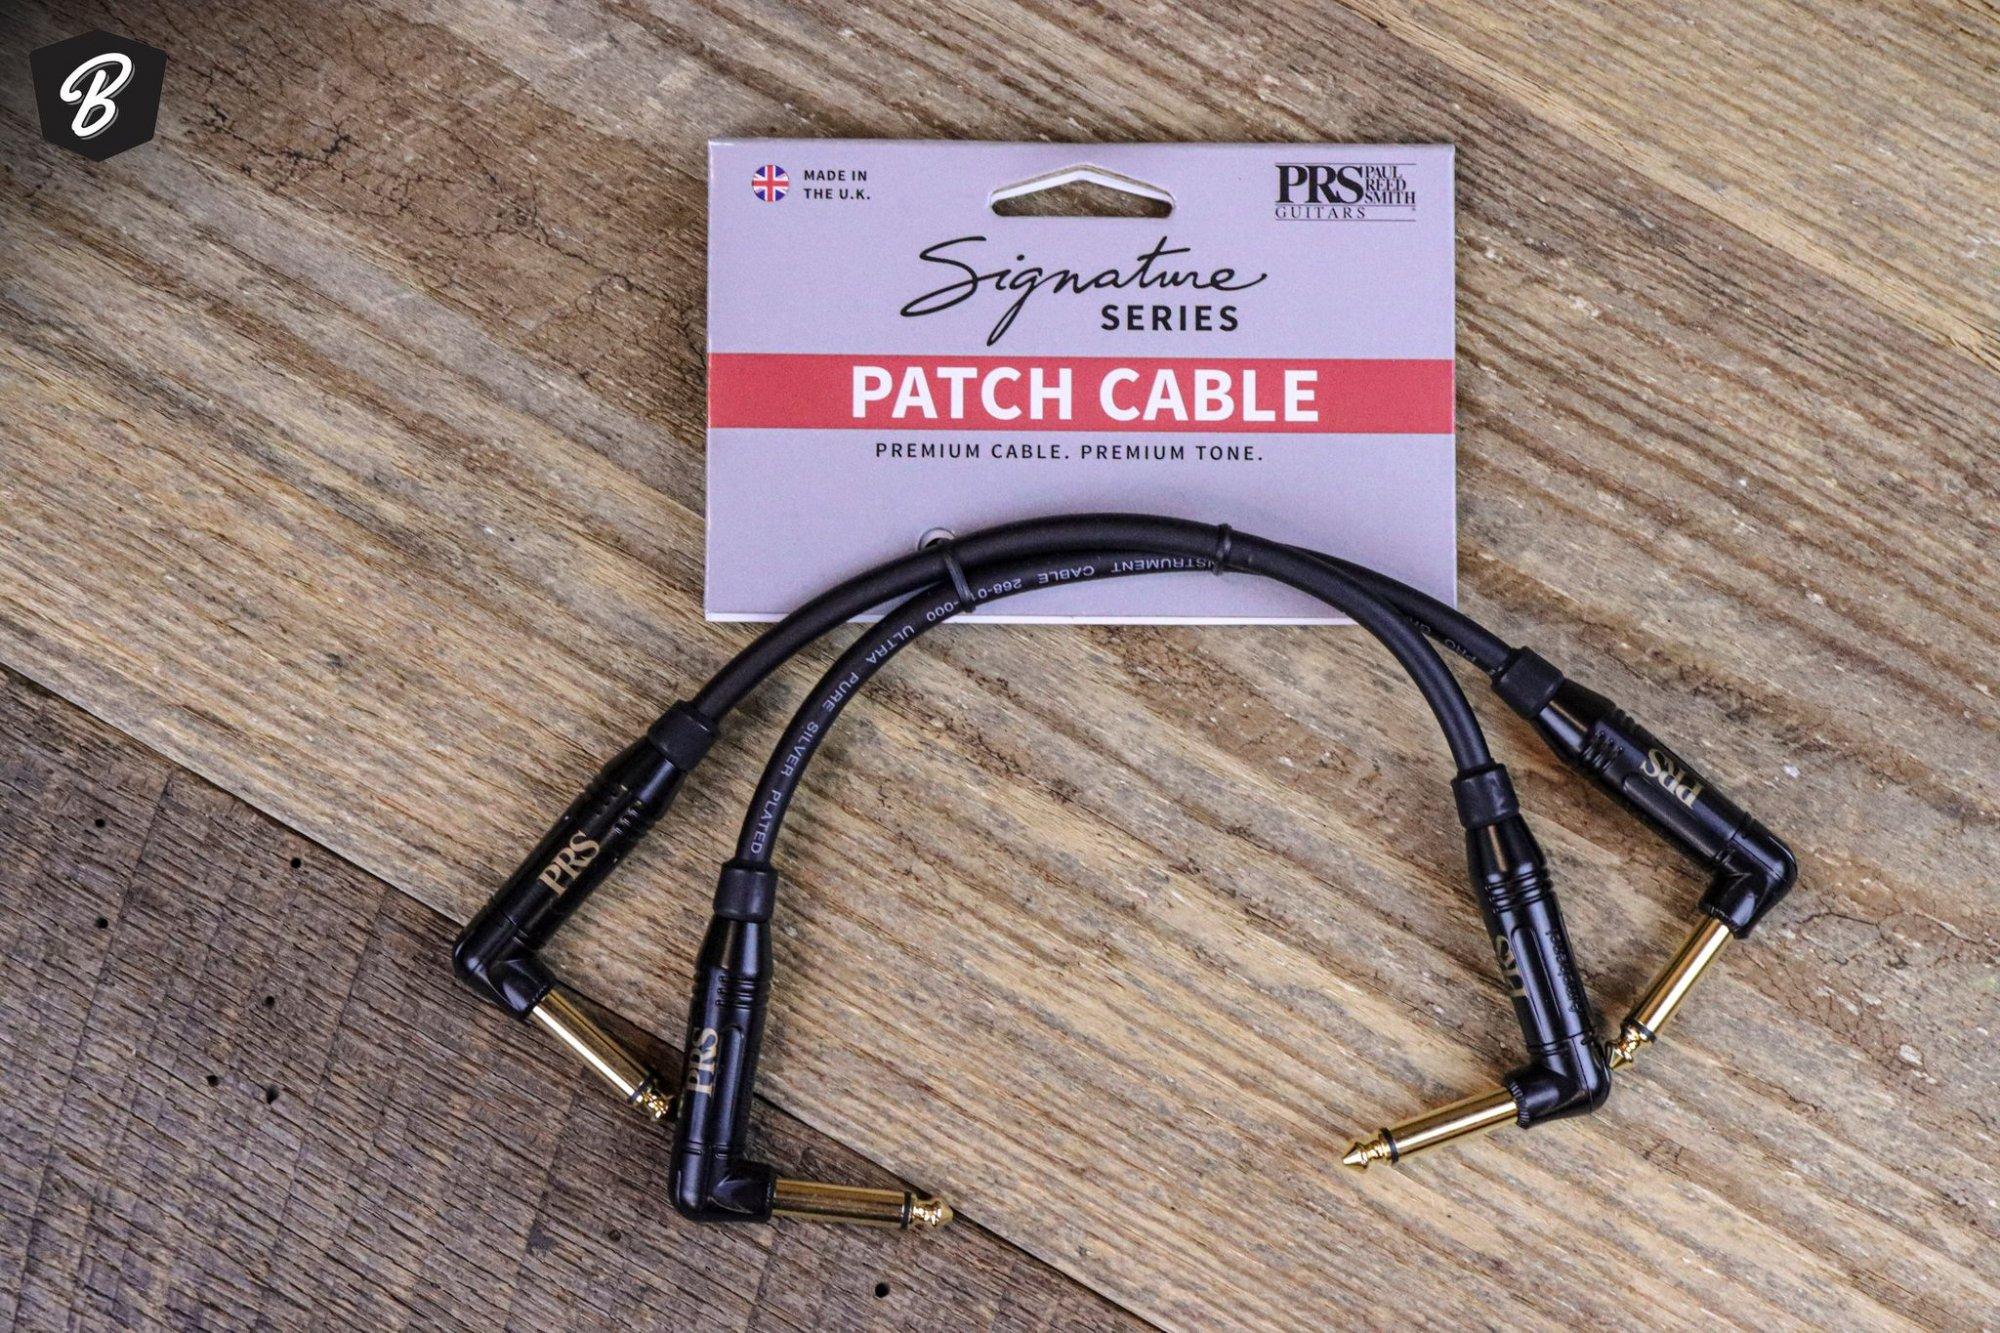 PRS Signature Series 6 Patch Cables- Includes 2